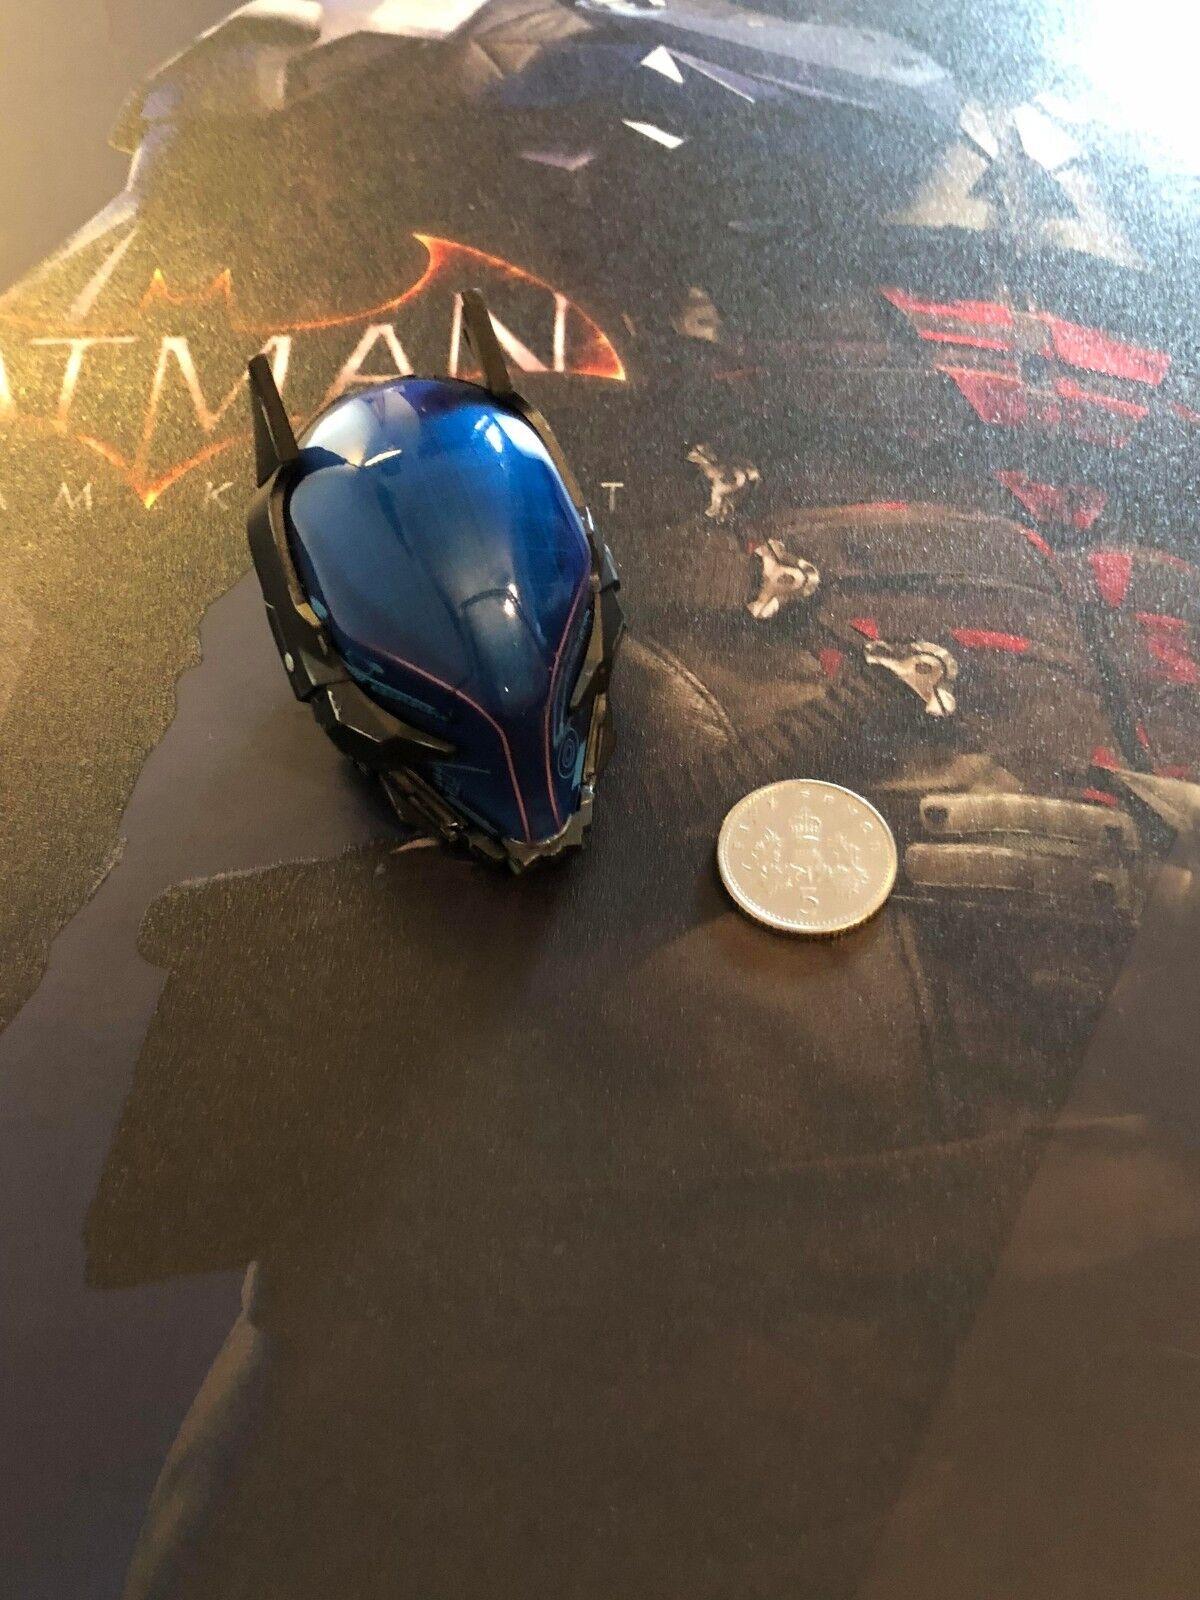 Hot Toys Batman Arkham Knight Blau Head Sculpt LED VGM28 loose 1/6th scale